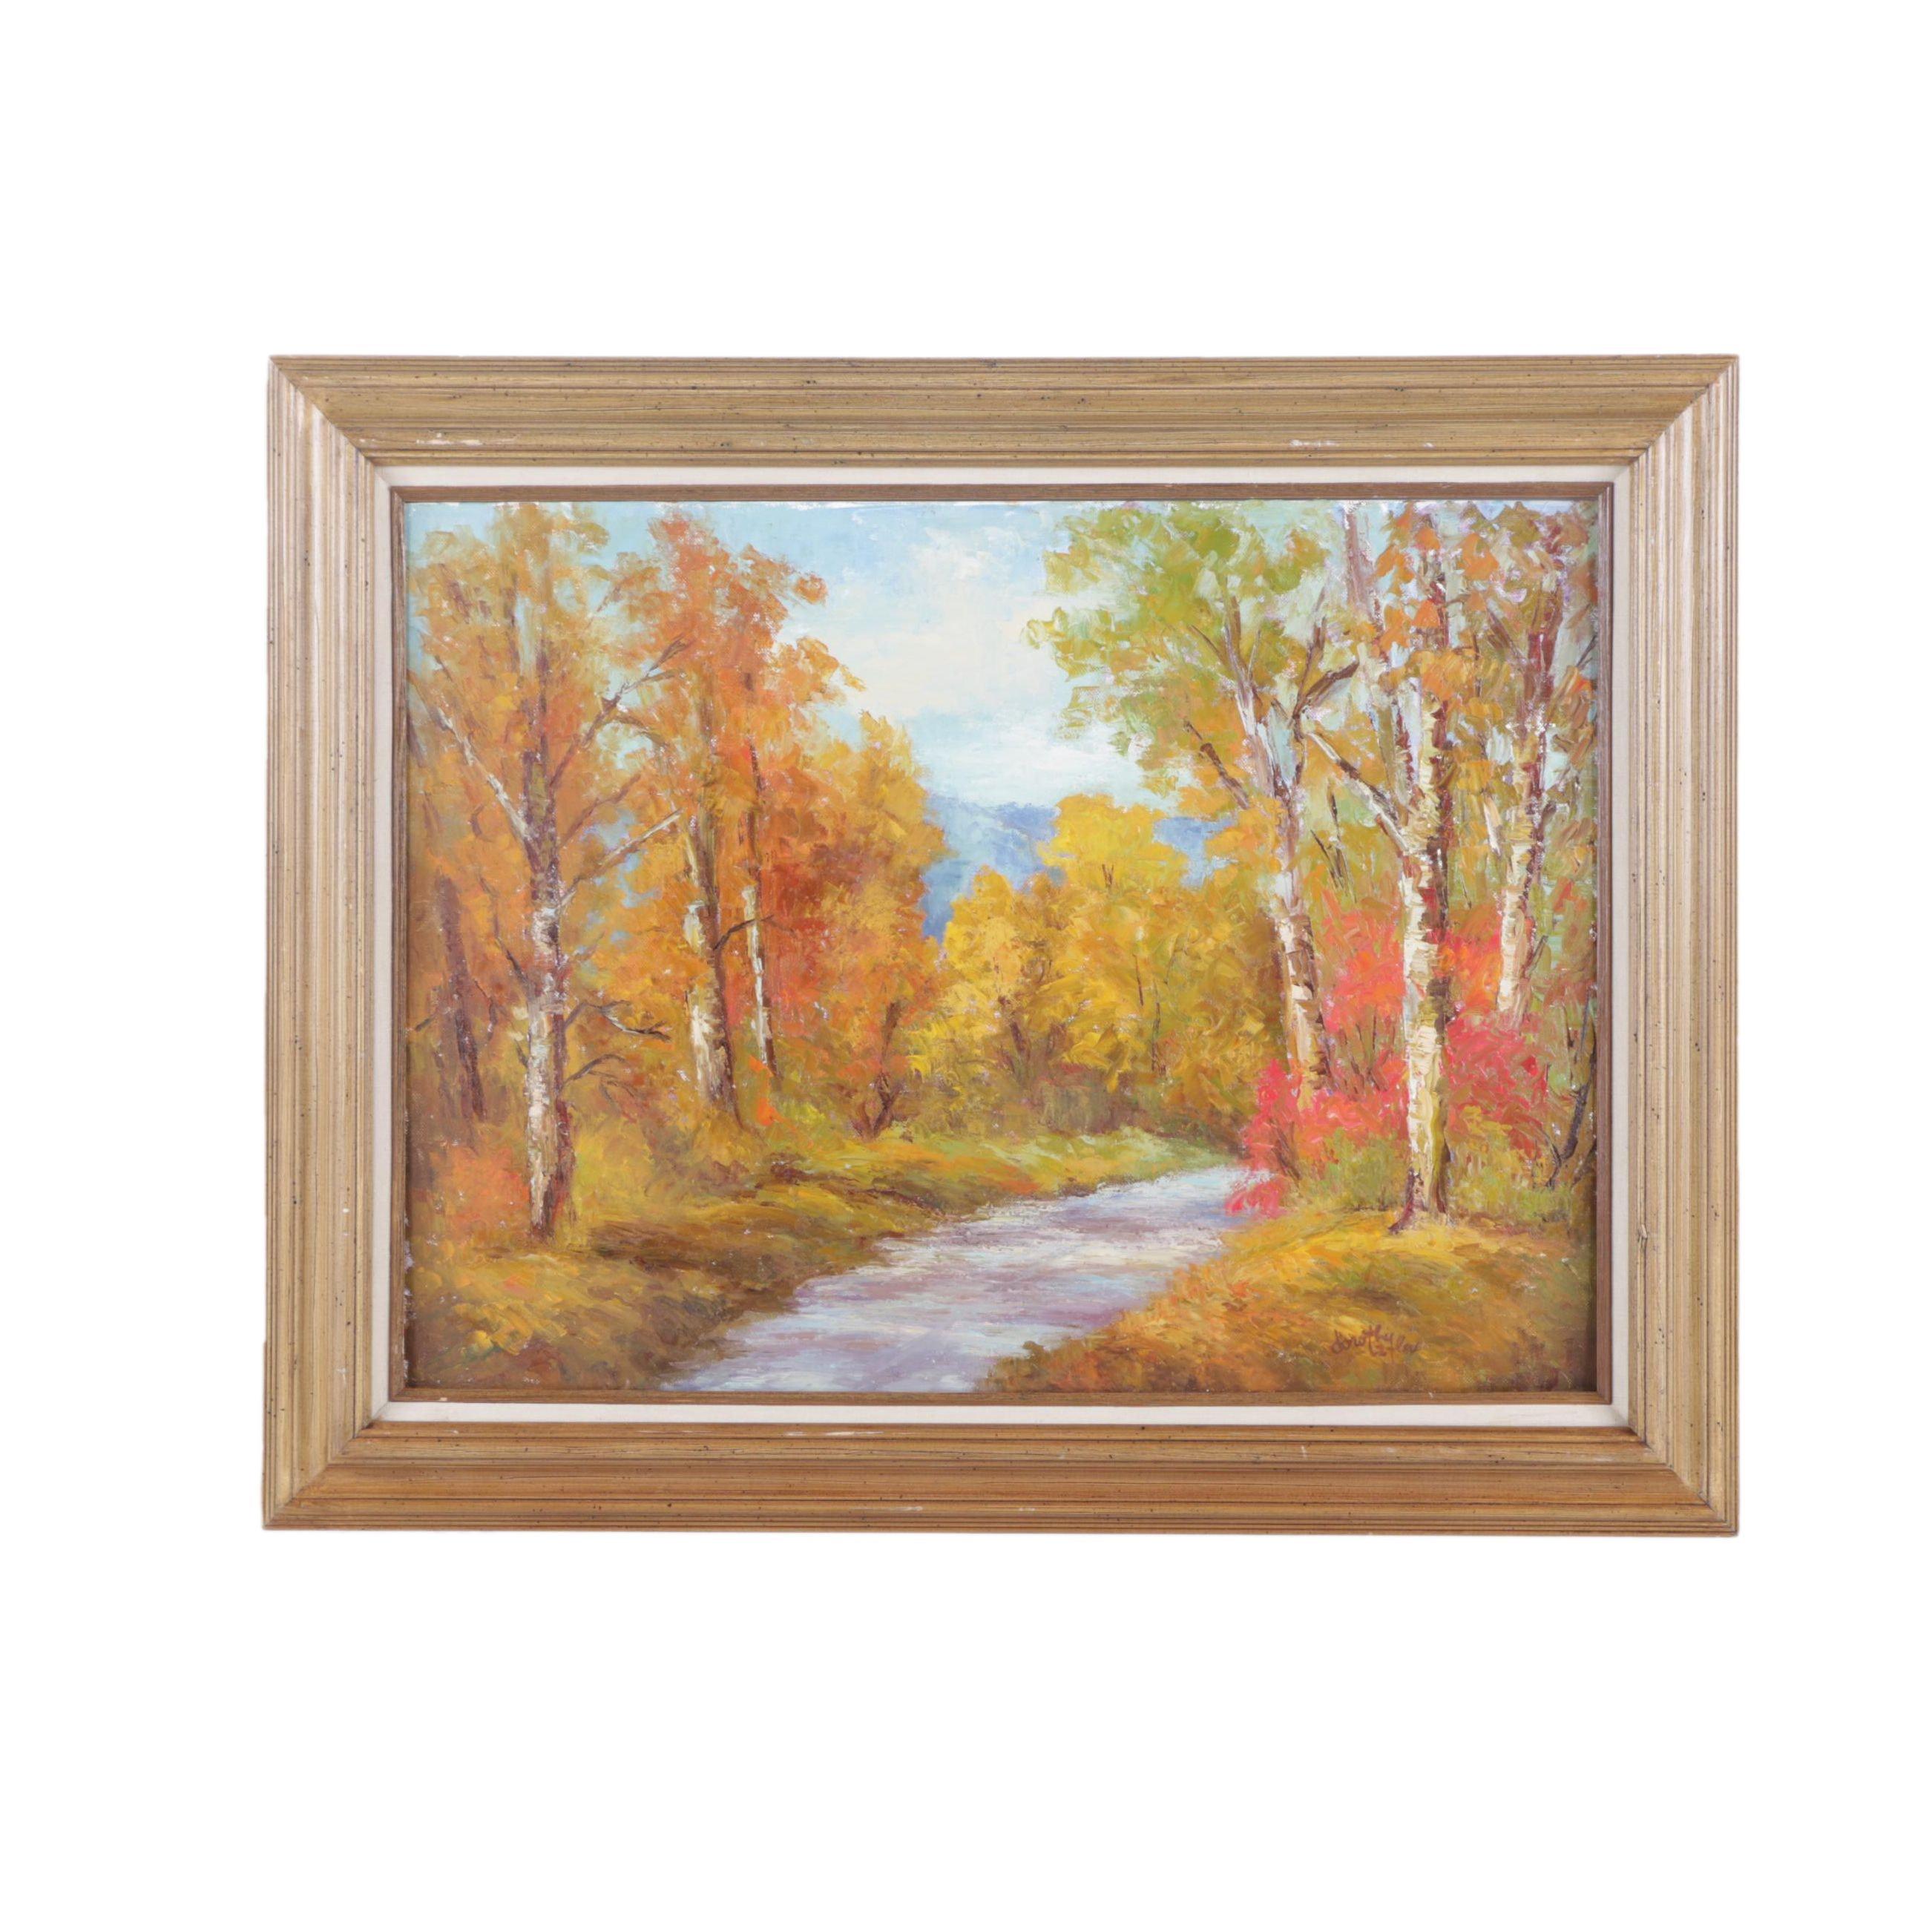 Dorothy Laflor Oil Painting on Canvas Board of Autumn Landscape